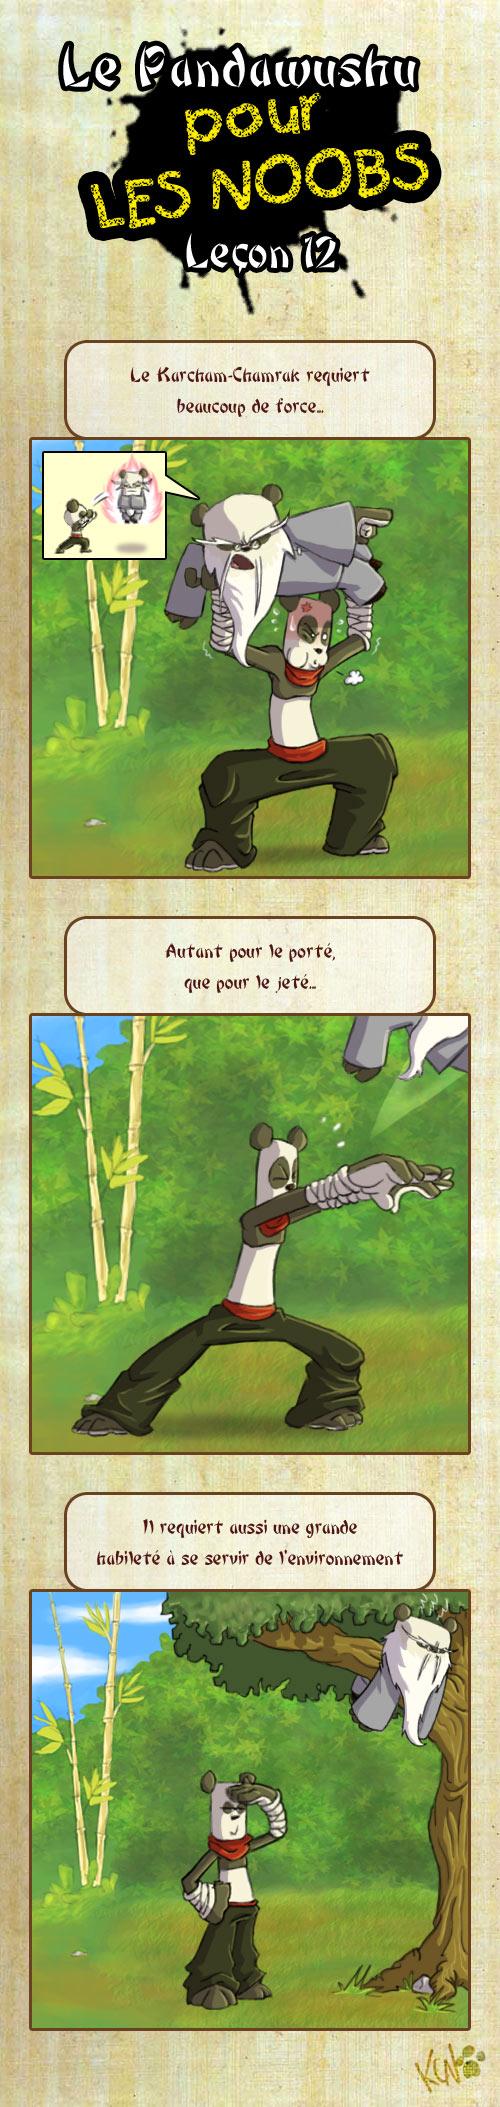 Le Pandawushu pour les Noobs Pandawushu12